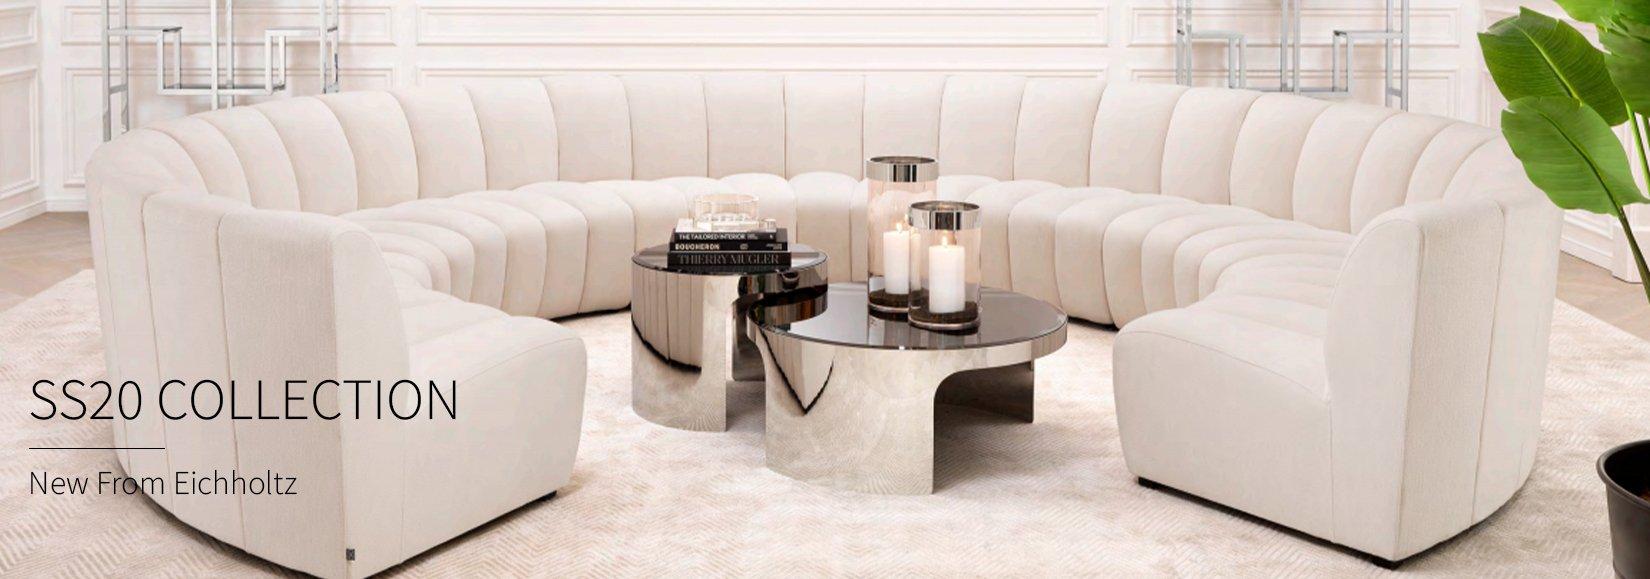 Eichholtz New Furniture and Accessories